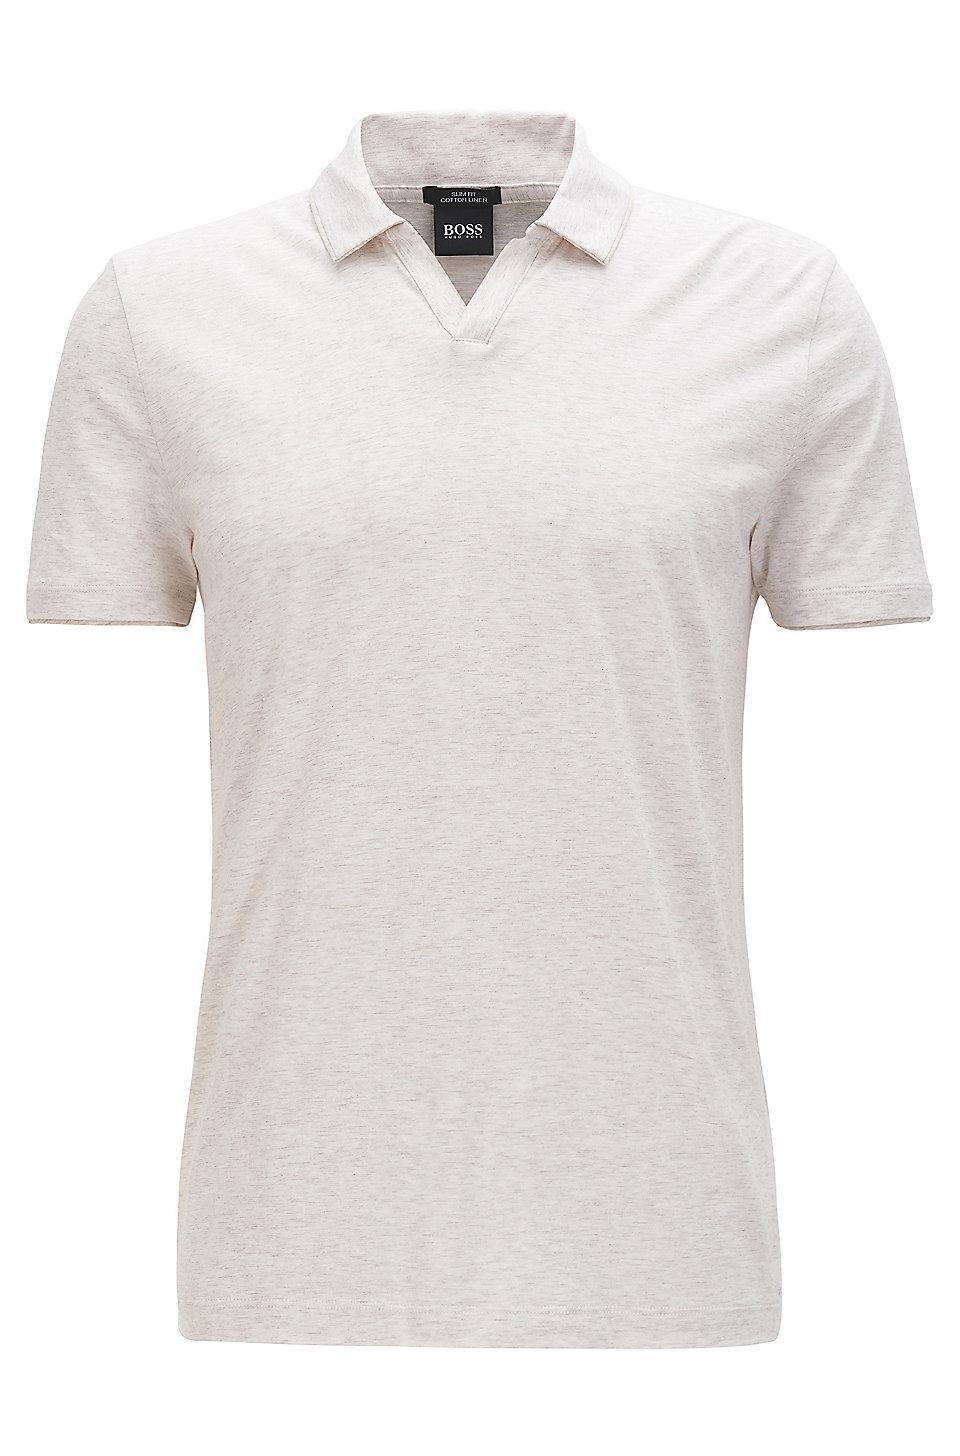 Boss Cotton Linen Polo Shirt Slim Fit Plato